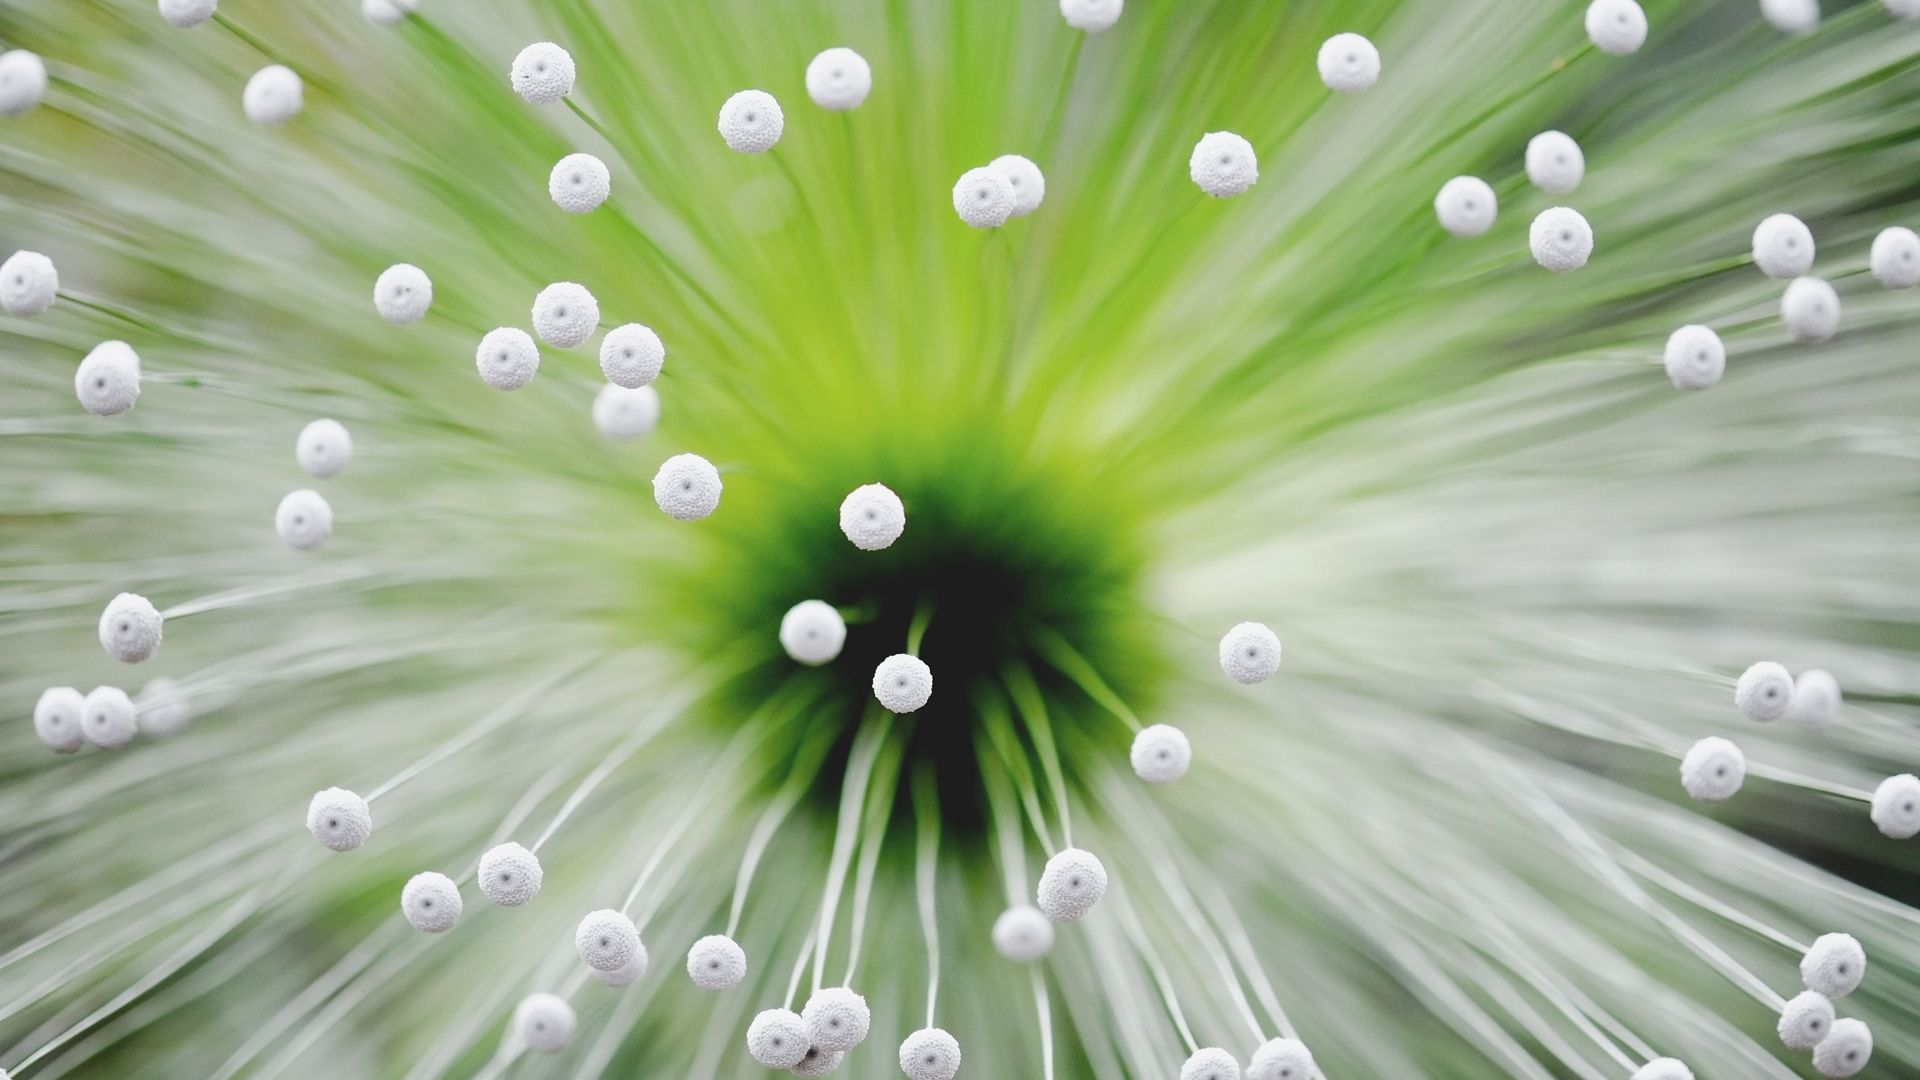 light, flower, tendrils - http://www.wallpapers4u.org/light-flower-tendrils/